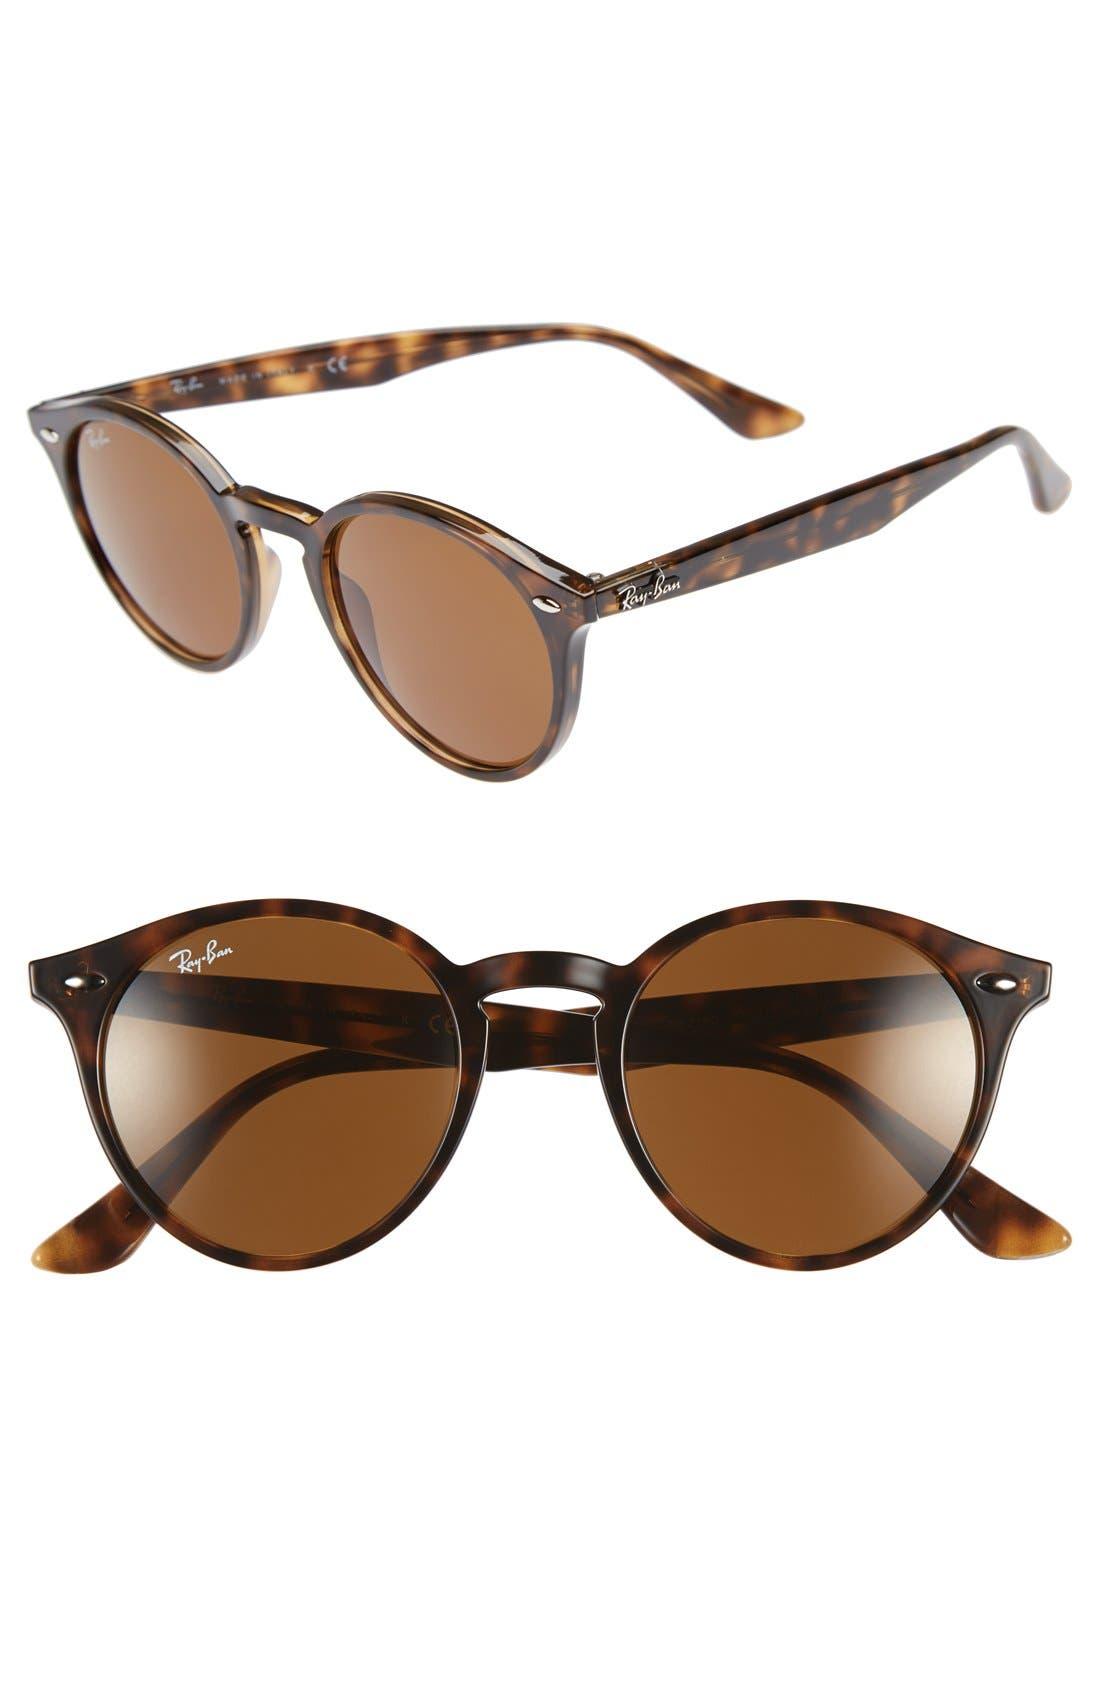 Ray-Ban Highstreet 49mm Round Sunglasses